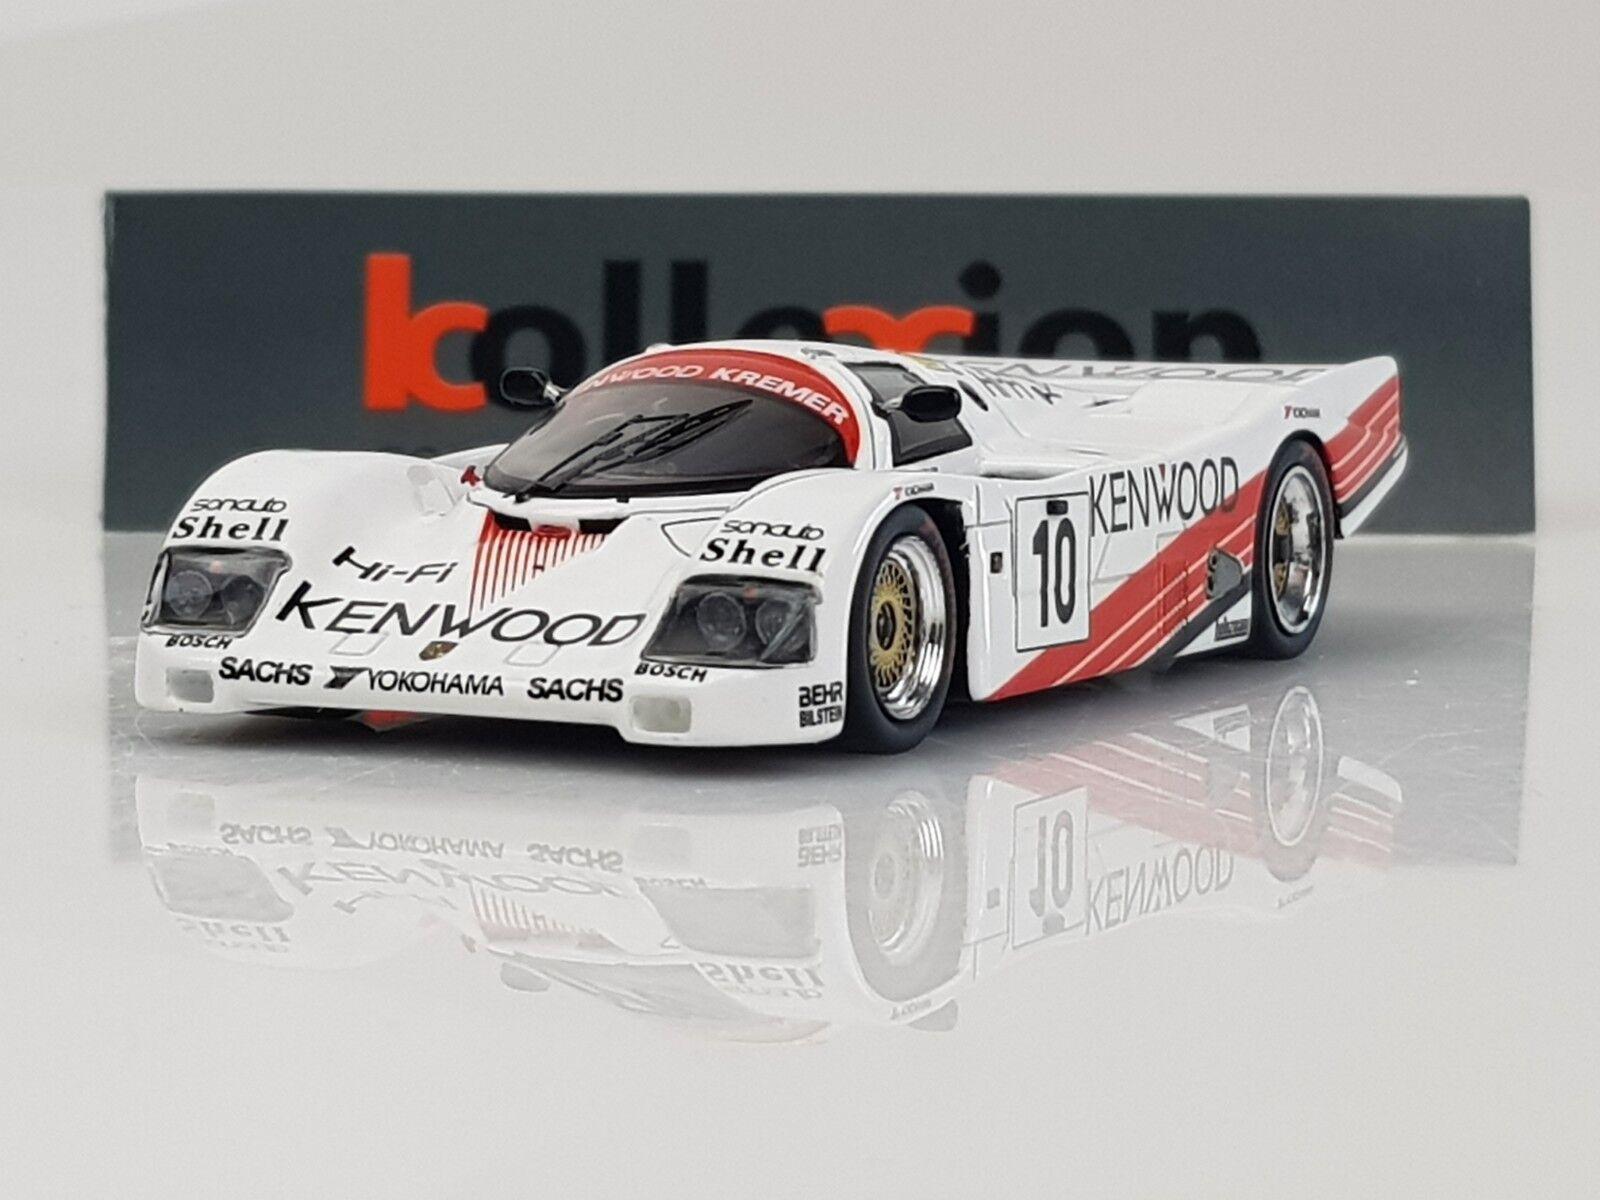 SPARK KBS024 PORSCHE 962 C Kenwood n°10 Le Mans 1987 1.43 NB